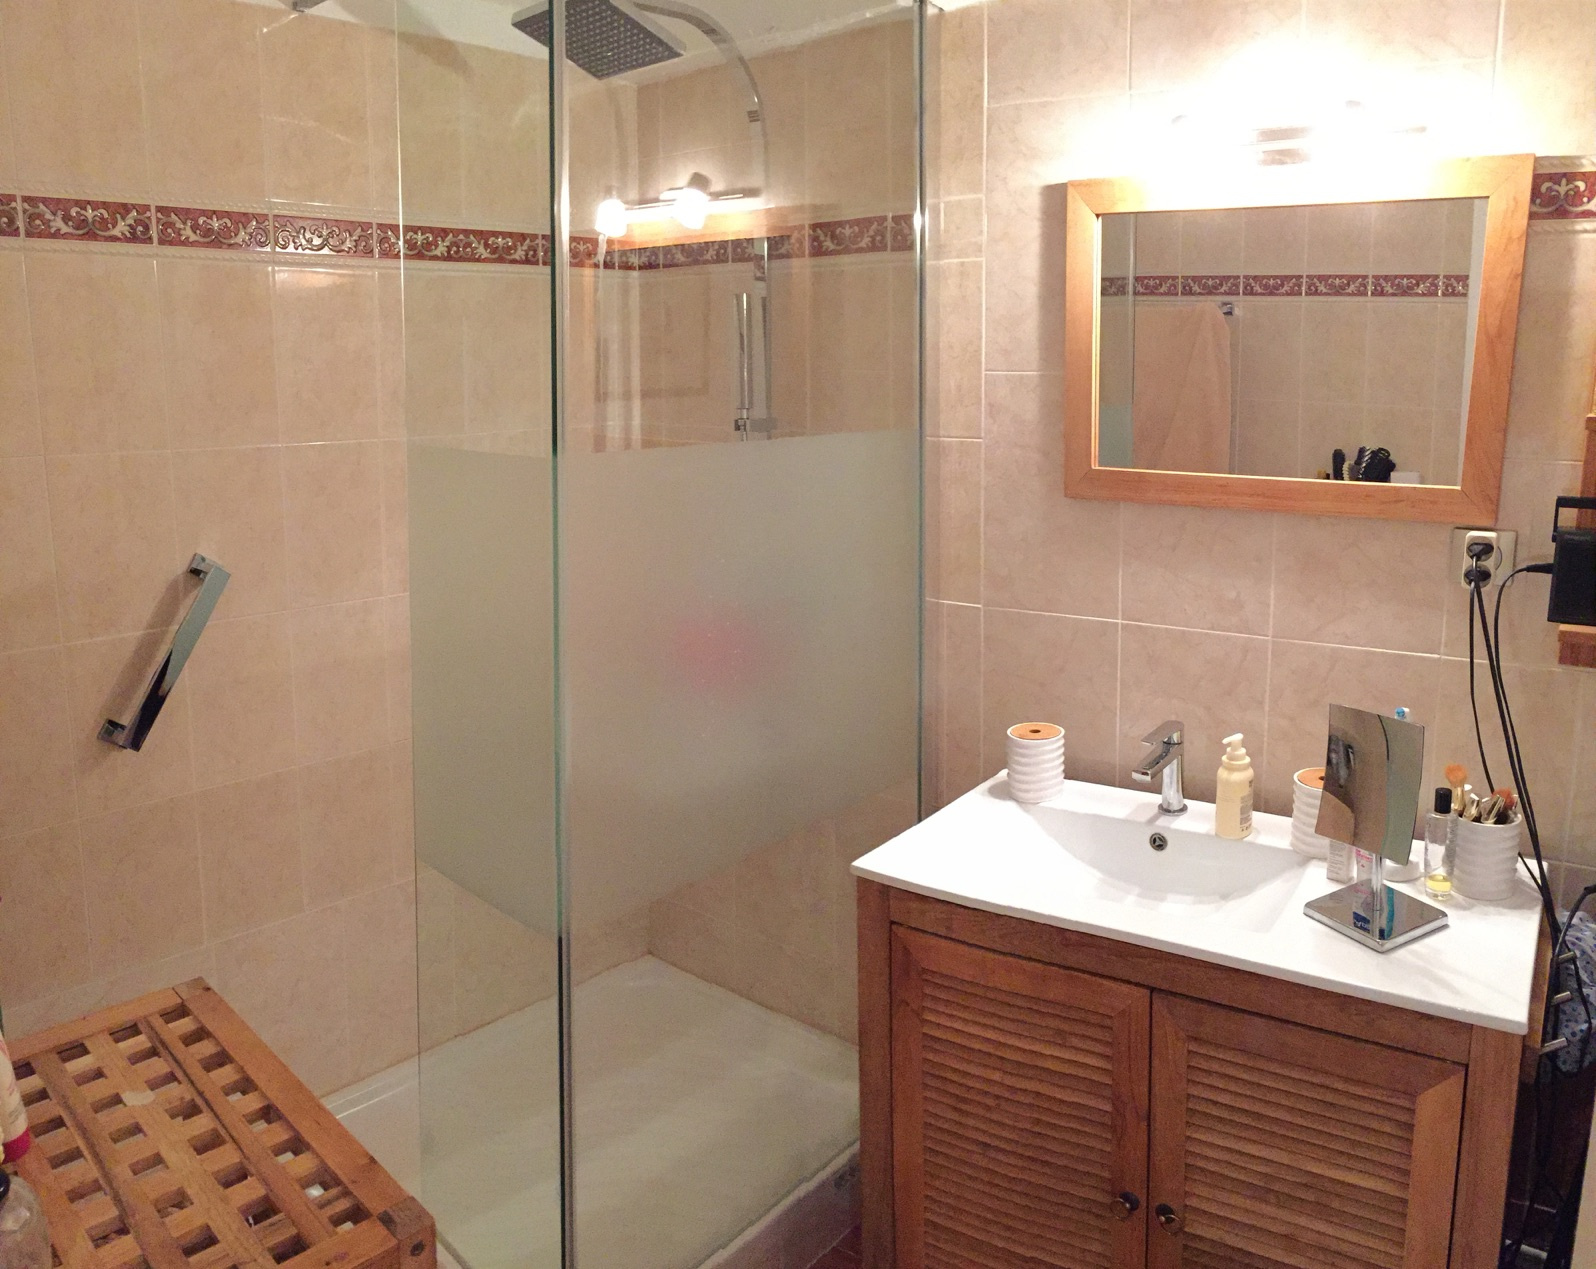 Annonce appartement 4 pieces nice vente 590 - Compromis de vente garage ...